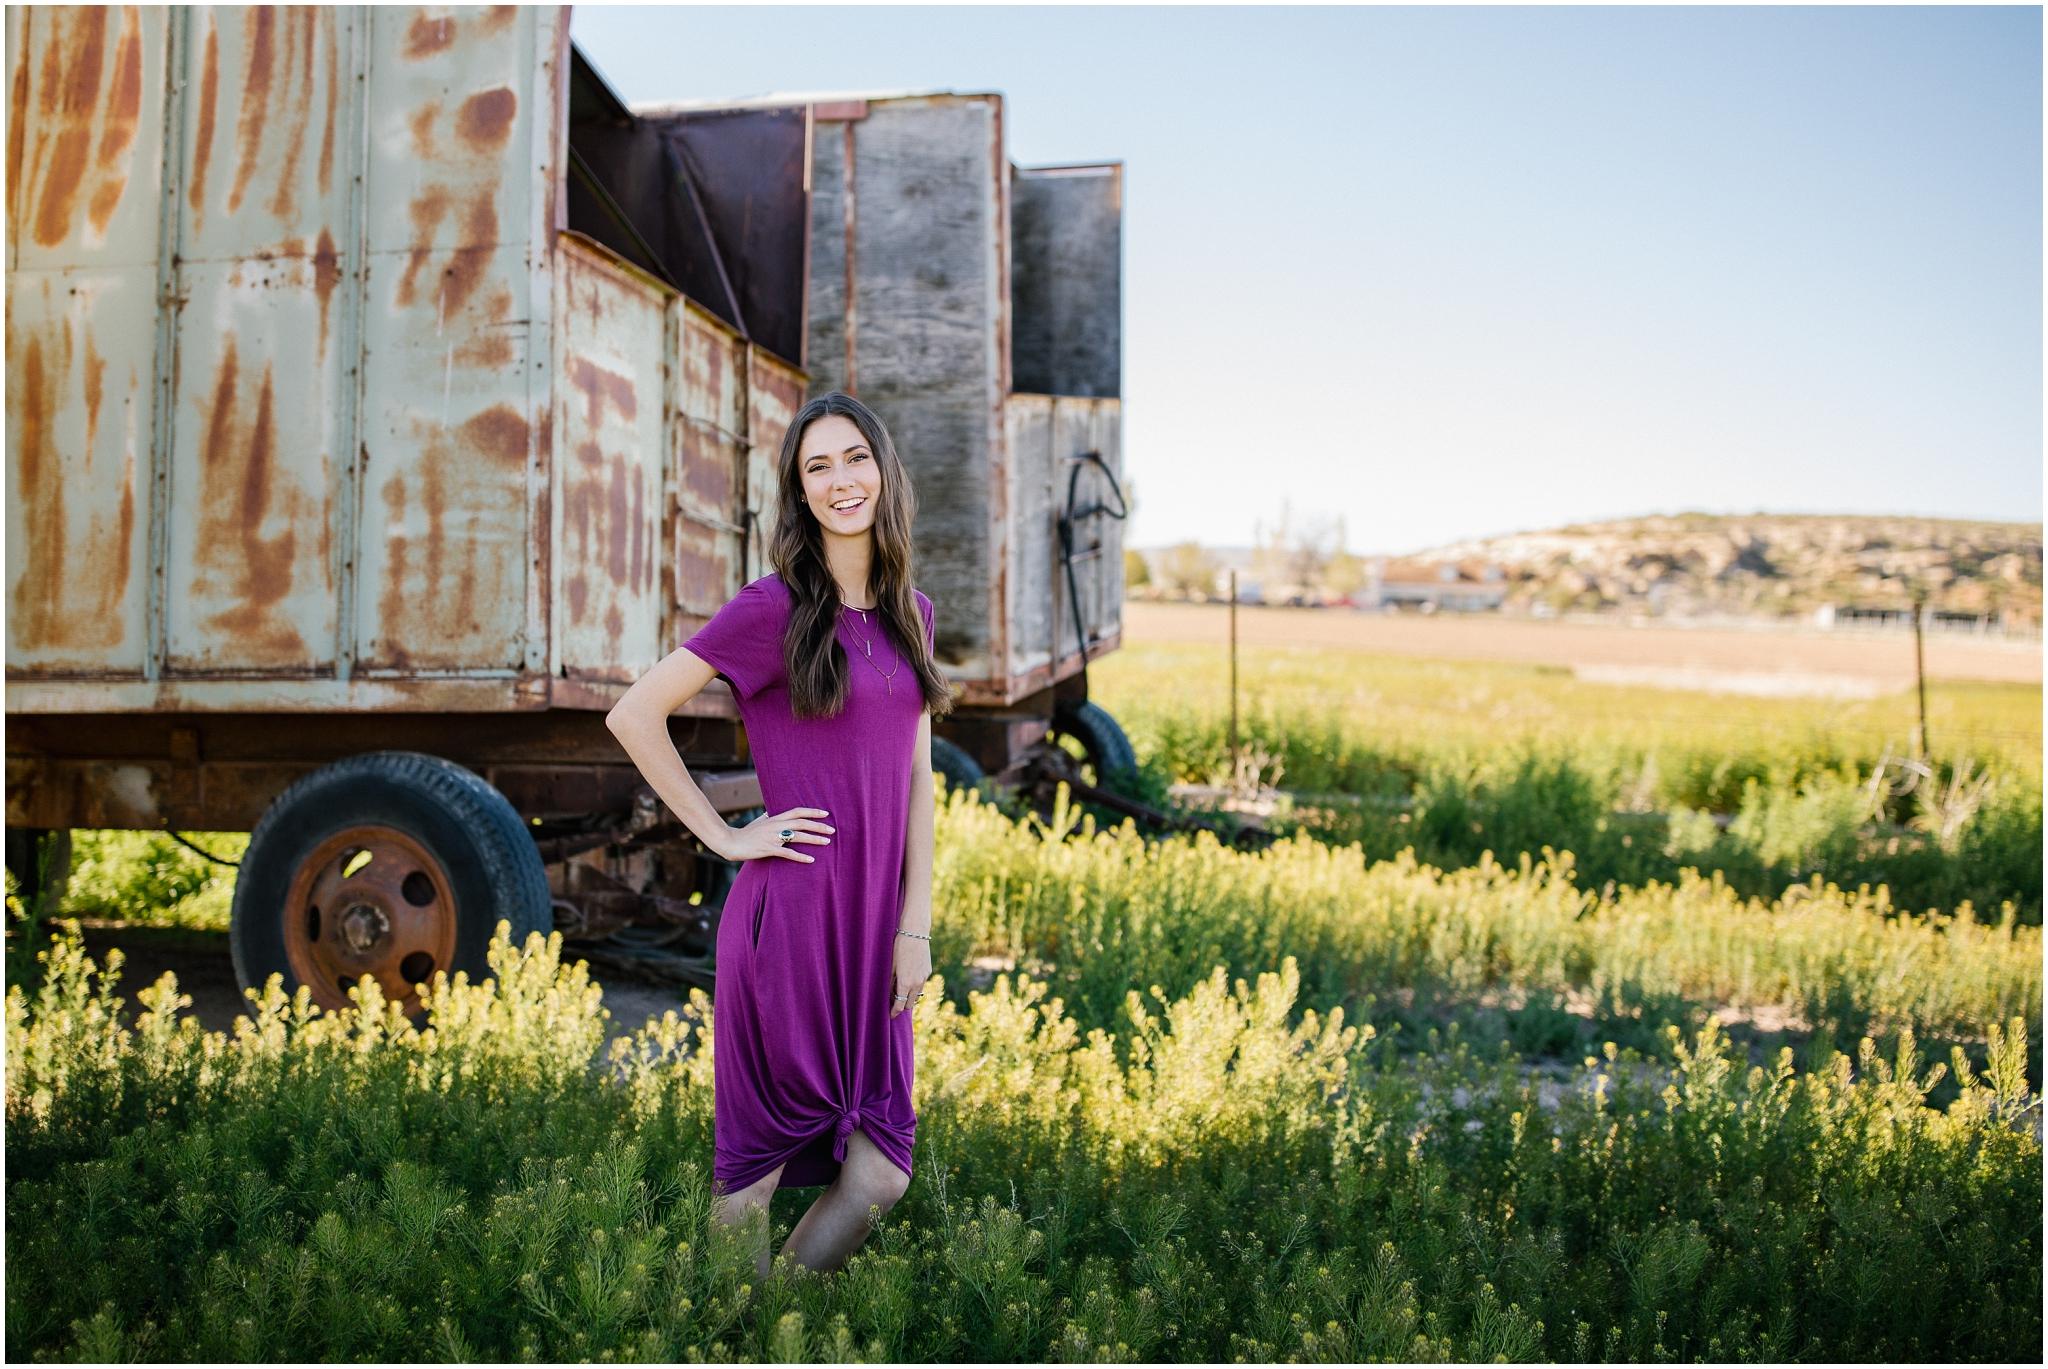 Lizzie-B-Imagery-Utah-Senior-Photographer-Central- Utah-Photographer-Utah-County_0011.jpg